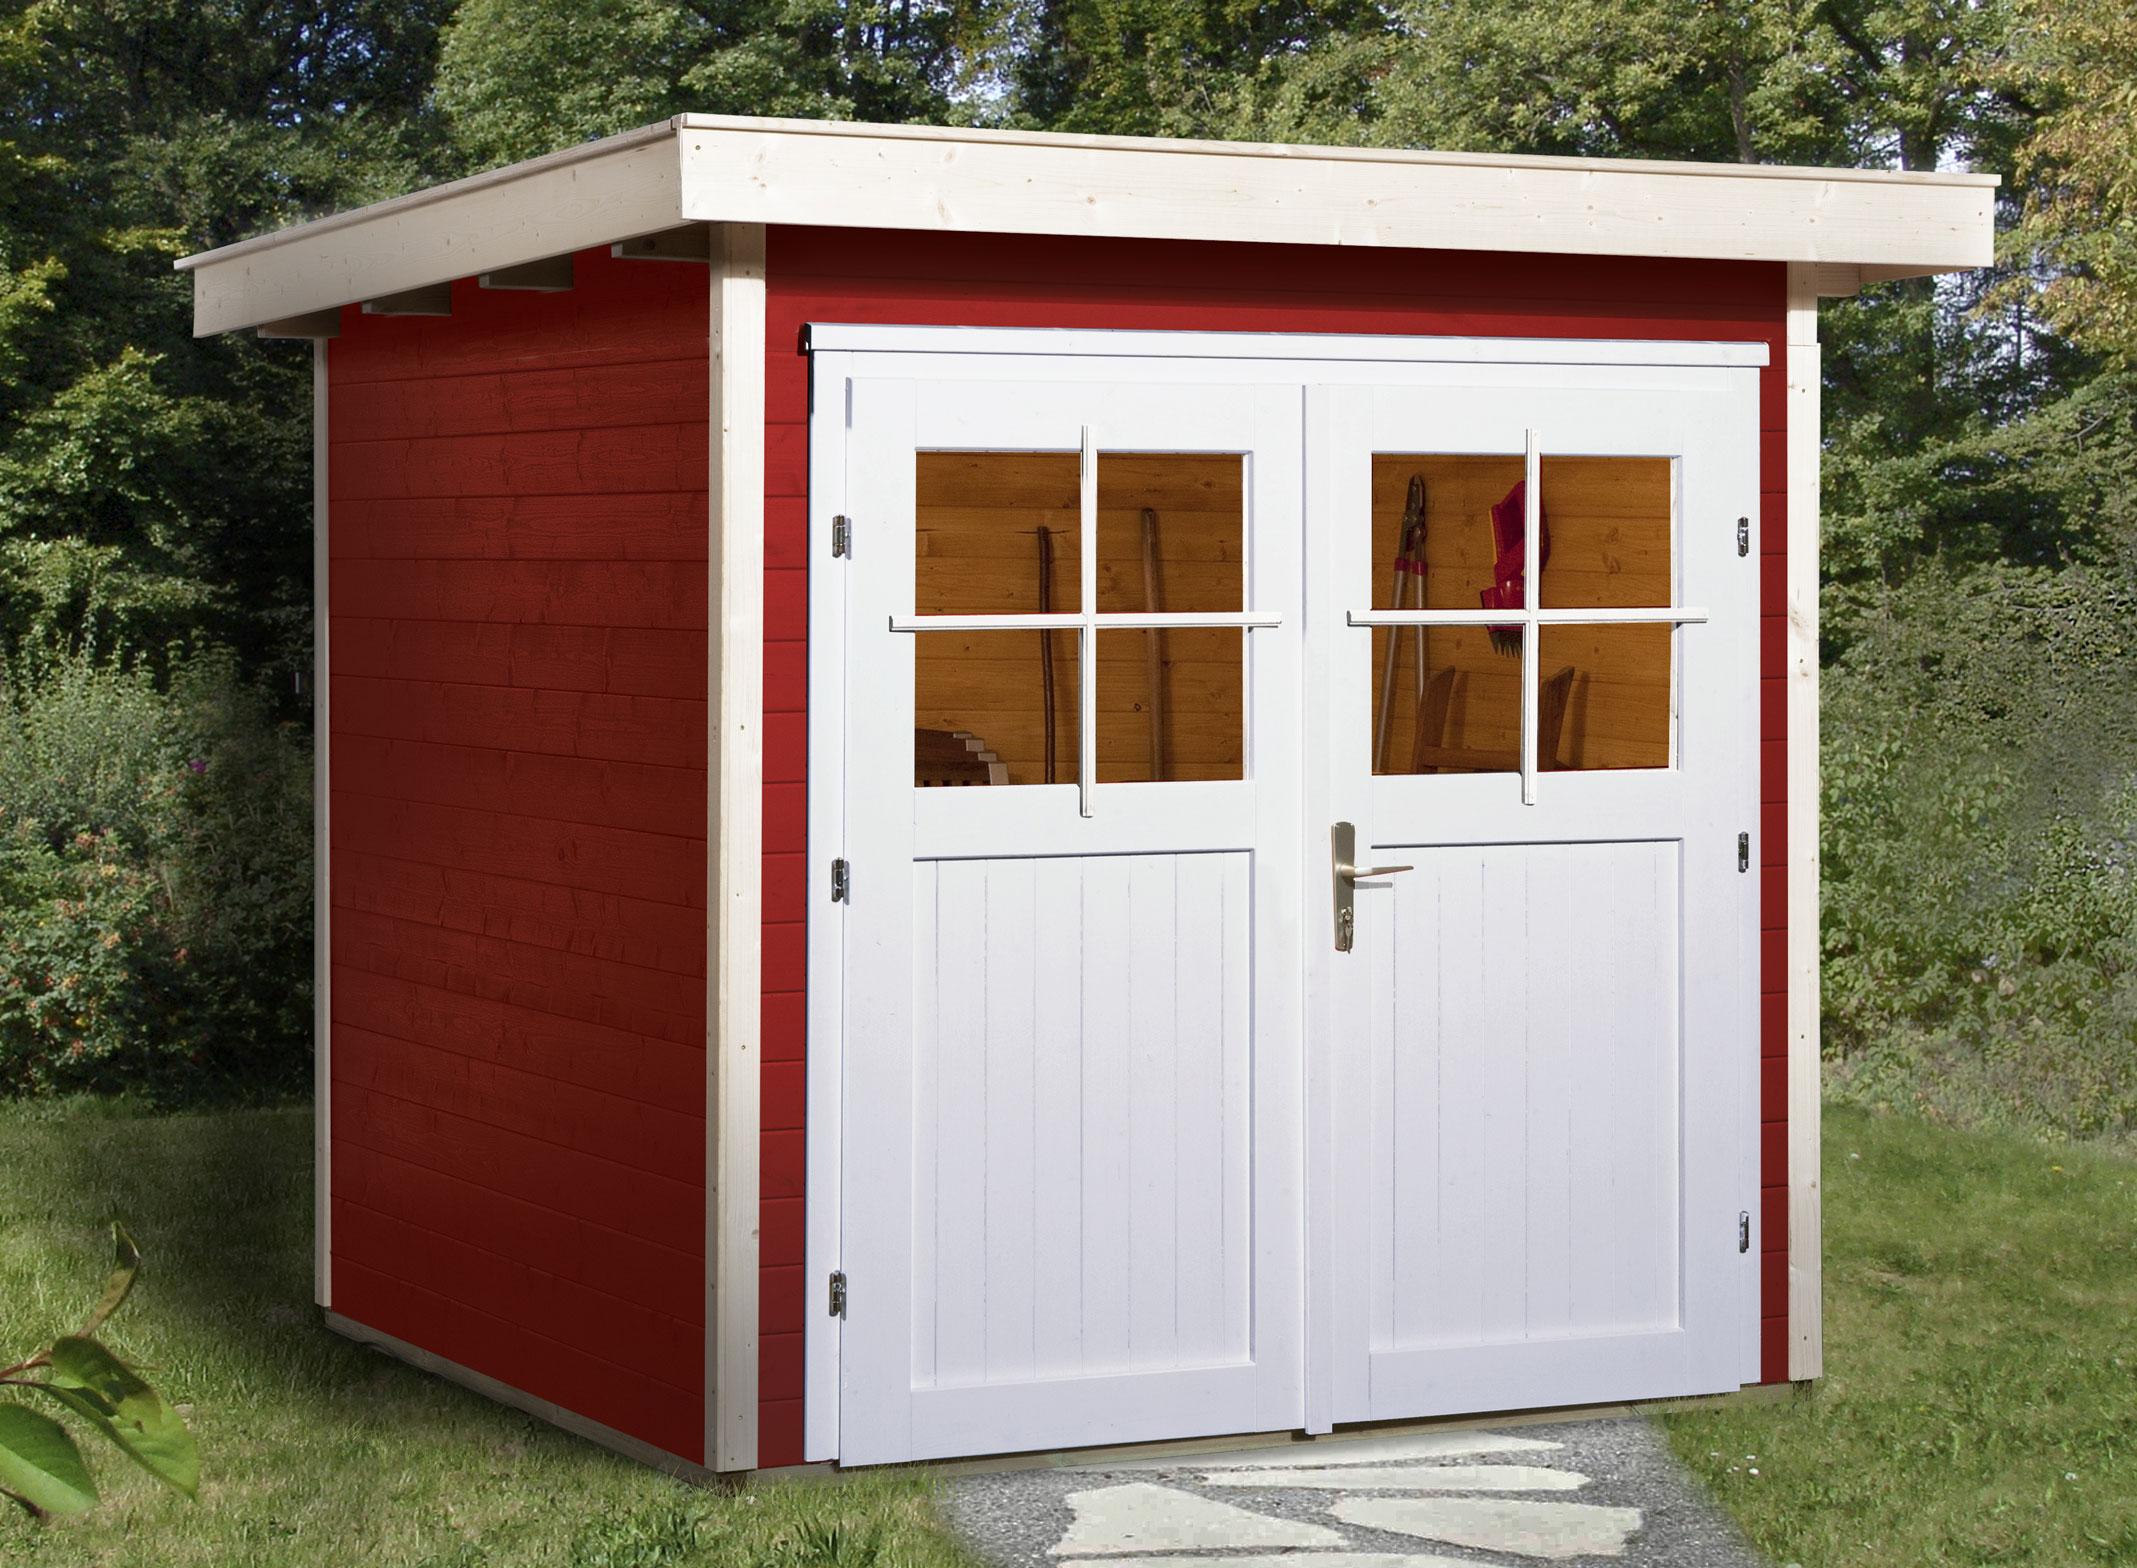 weka ger tehaus 21 mm gartenhaus 227 gr 3 rot 315x280cm bei. Black Bedroom Furniture Sets. Home Design Ideas